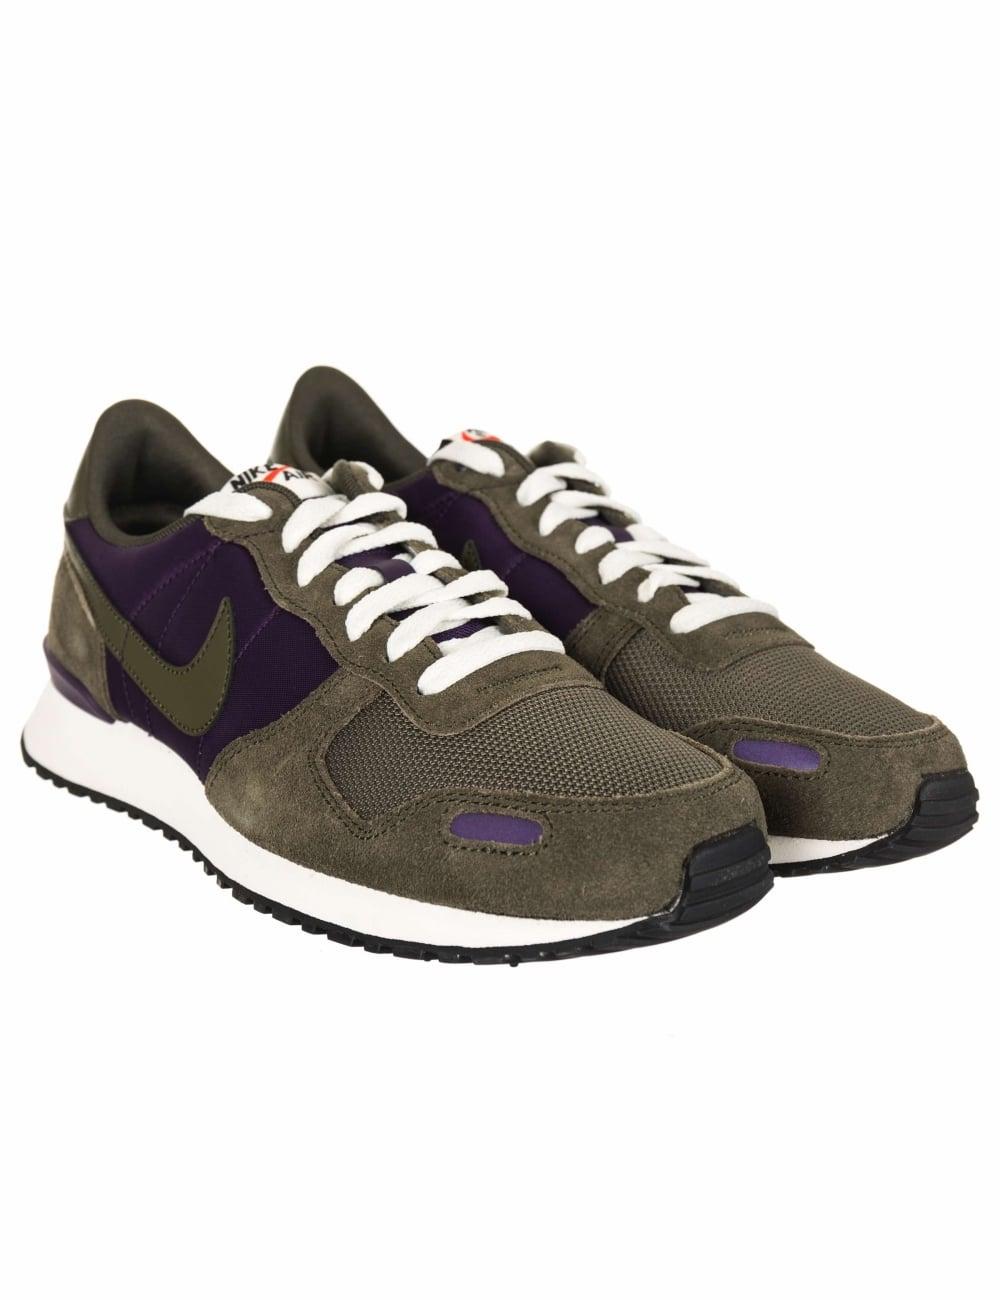 0103e733583e31 Nike Air Vortex Trainers - Grand Purple/Cargo Khaki - Footwear from ...